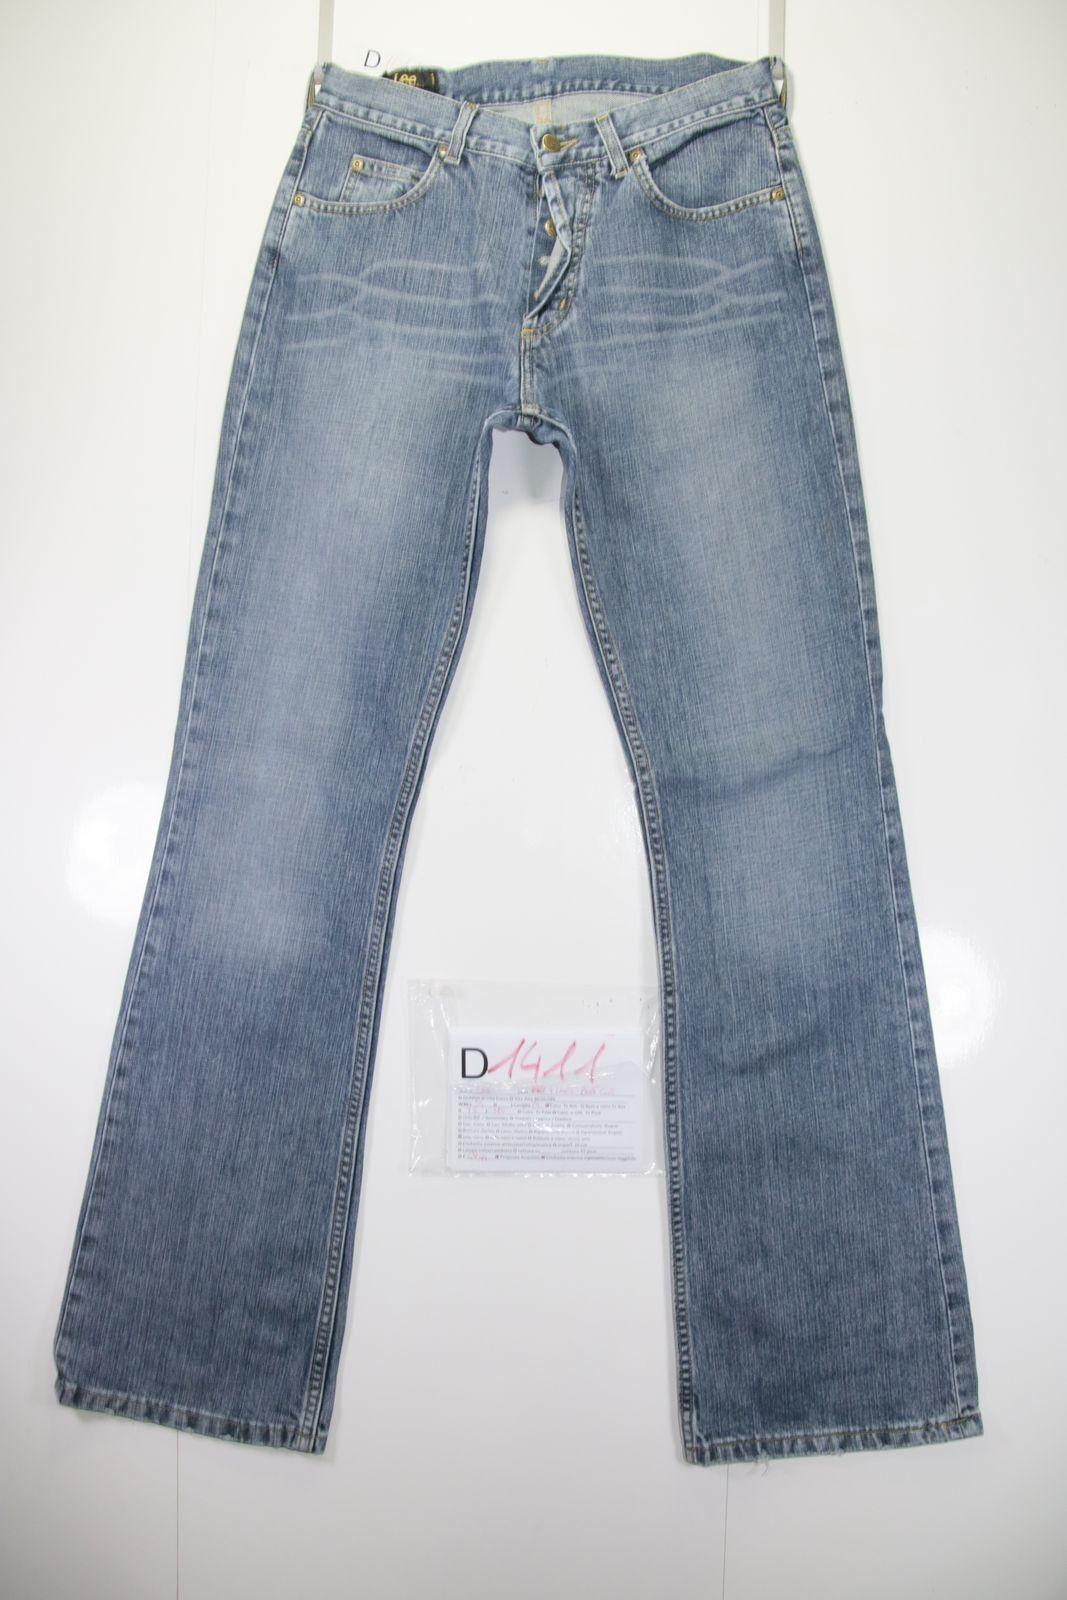 Lee Flare Bootcut (Cod. D1411) Tg44 W30 L34 jeans used High Waist Vintage street